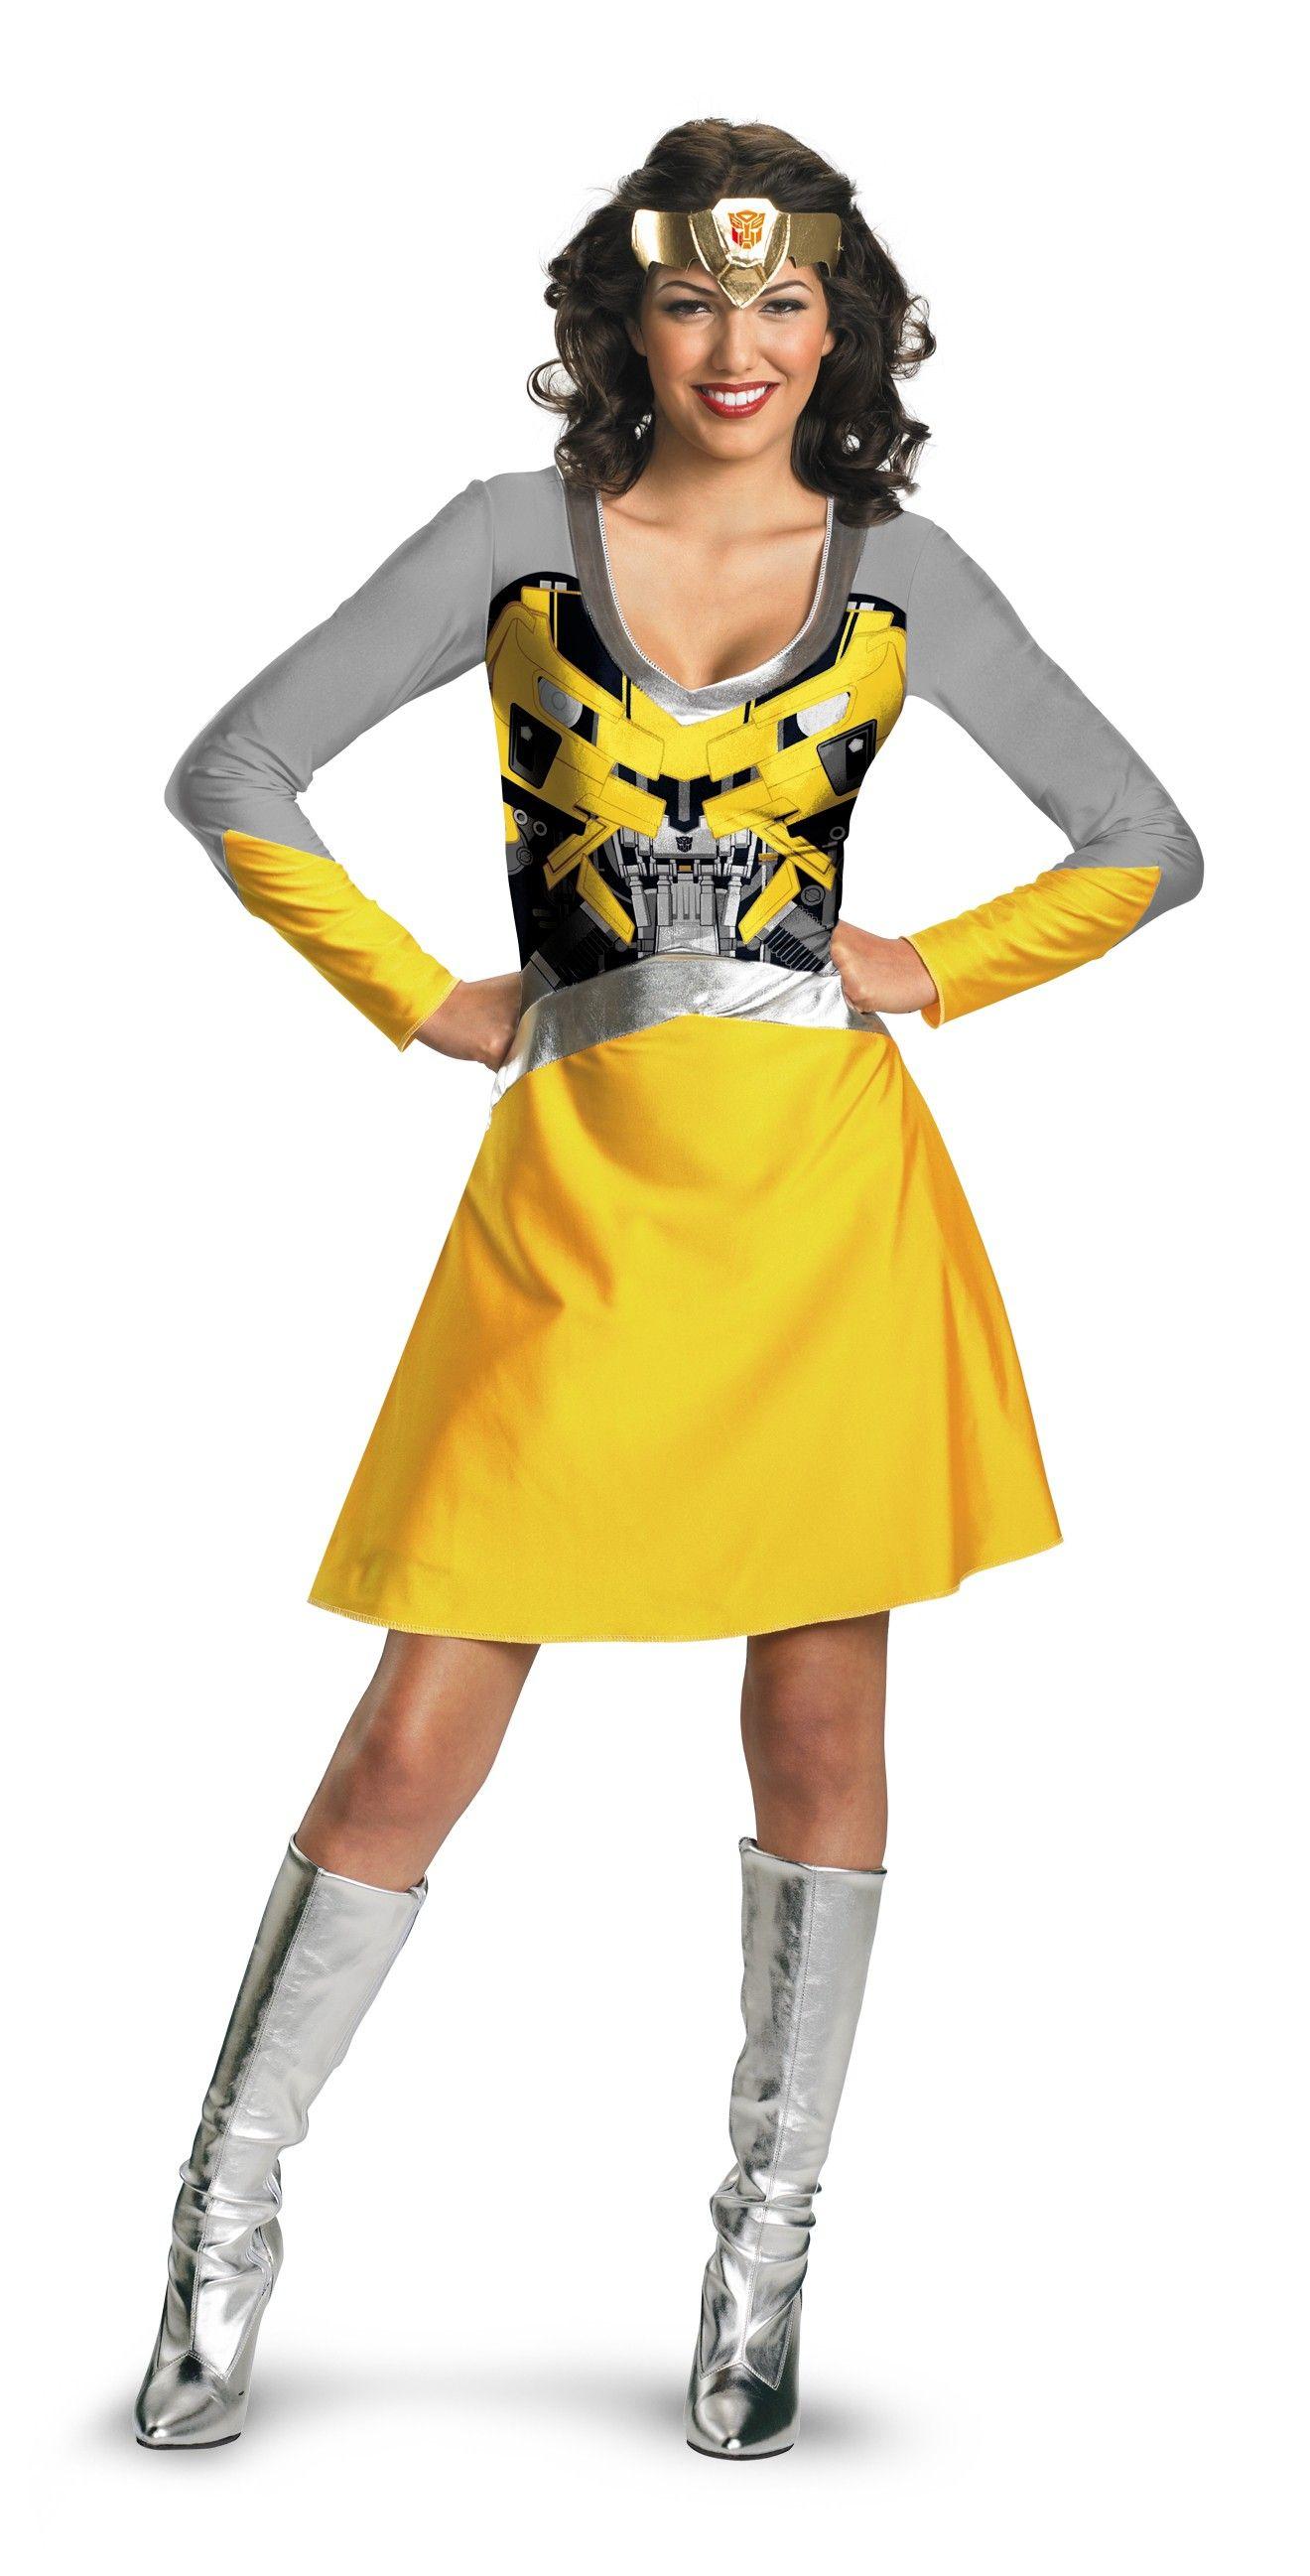 transformers 3 bumblebee female classic adult womens costume - Classic Womens Halloween Costumes